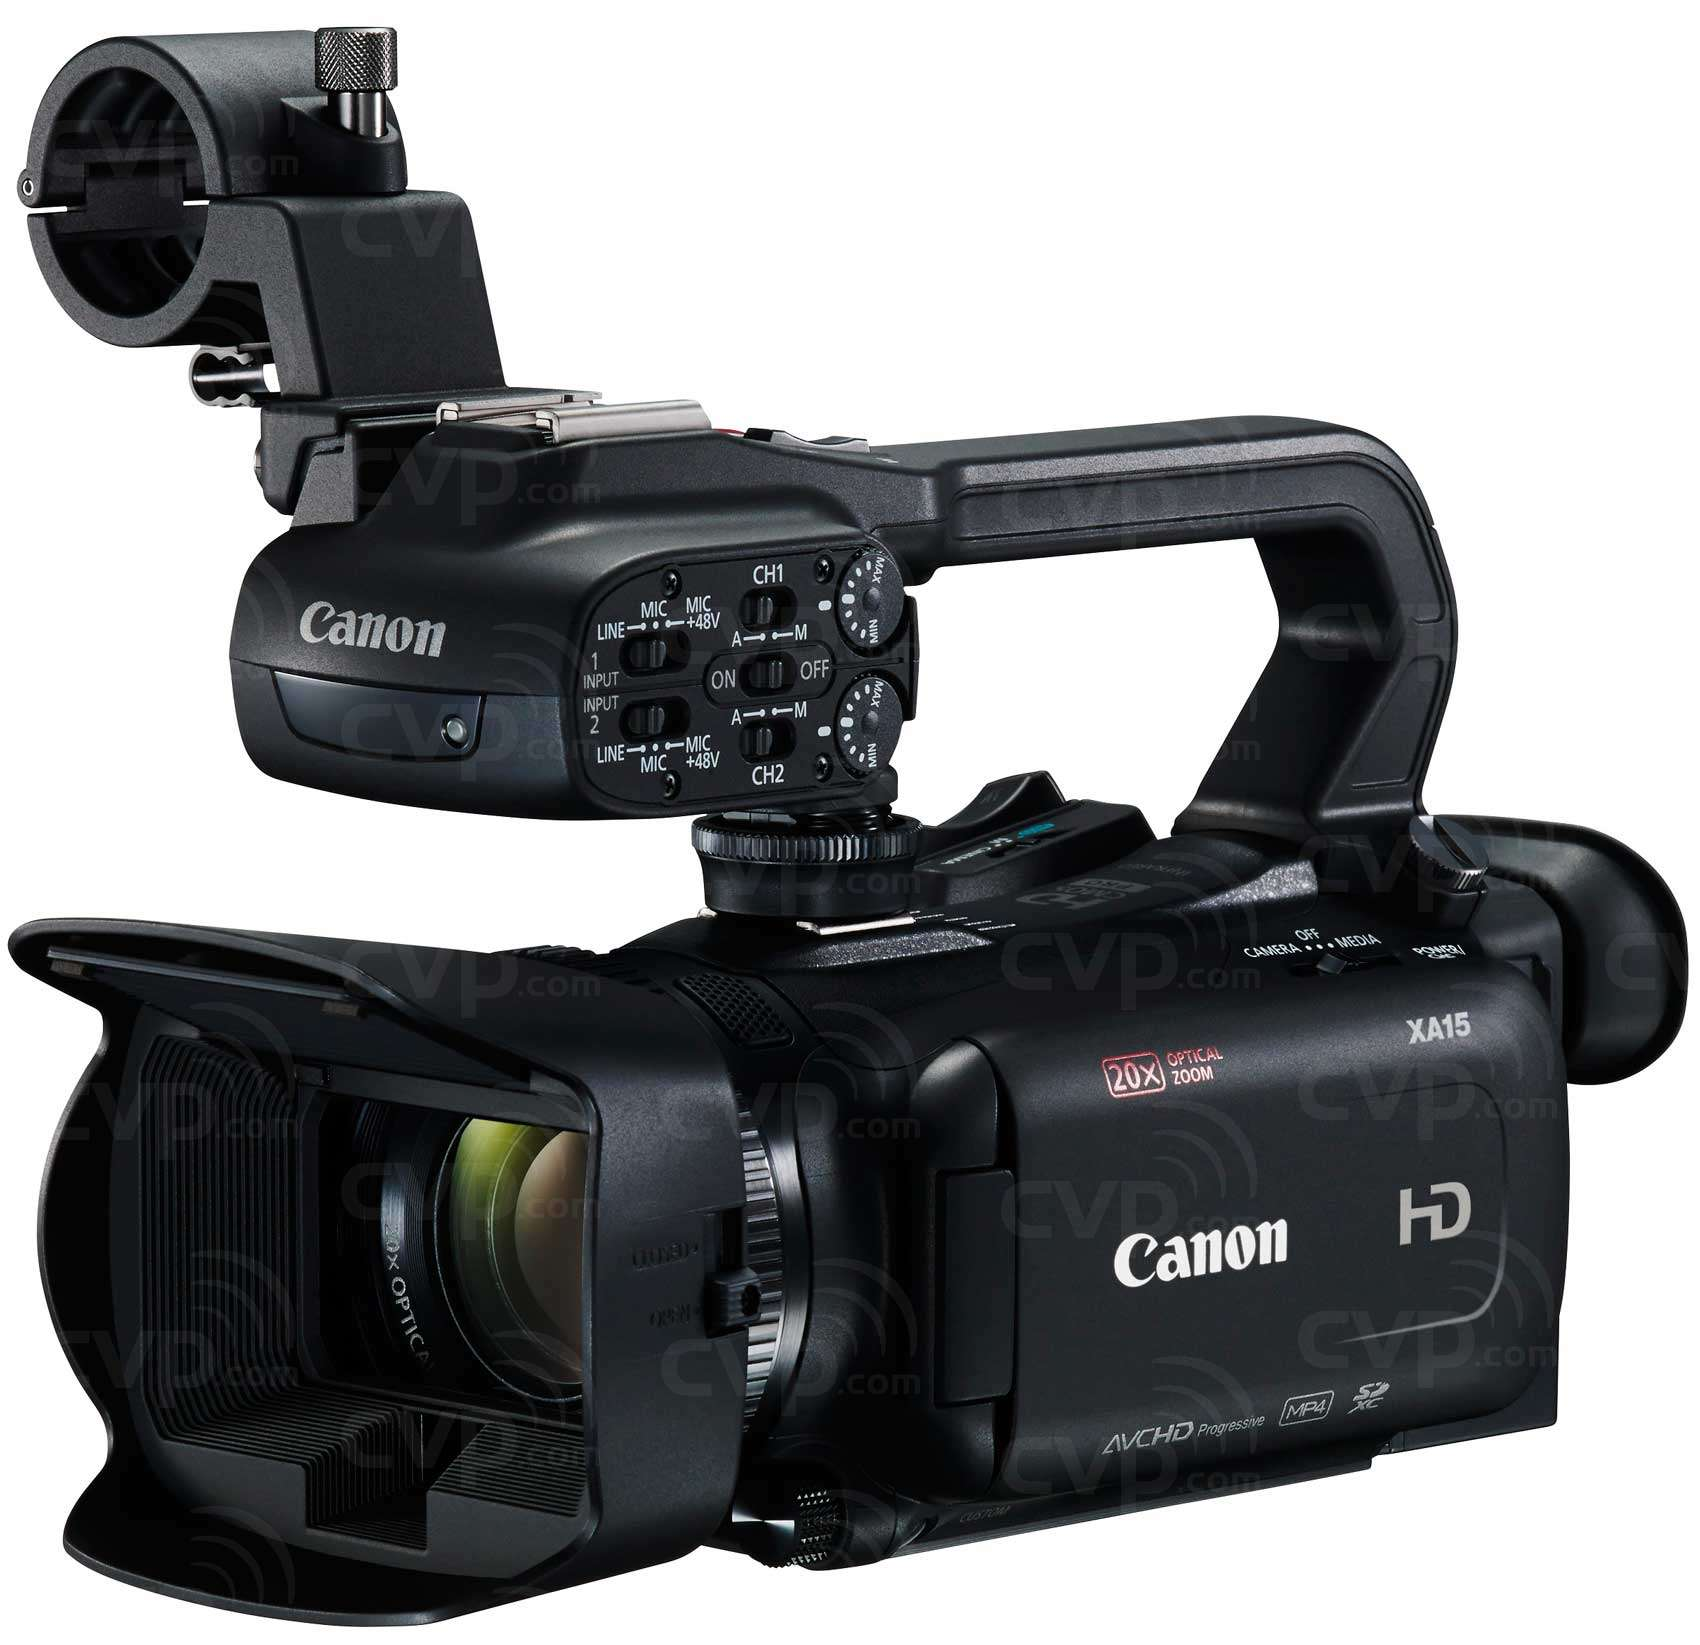 Canon XA15 Full HD Camcorder